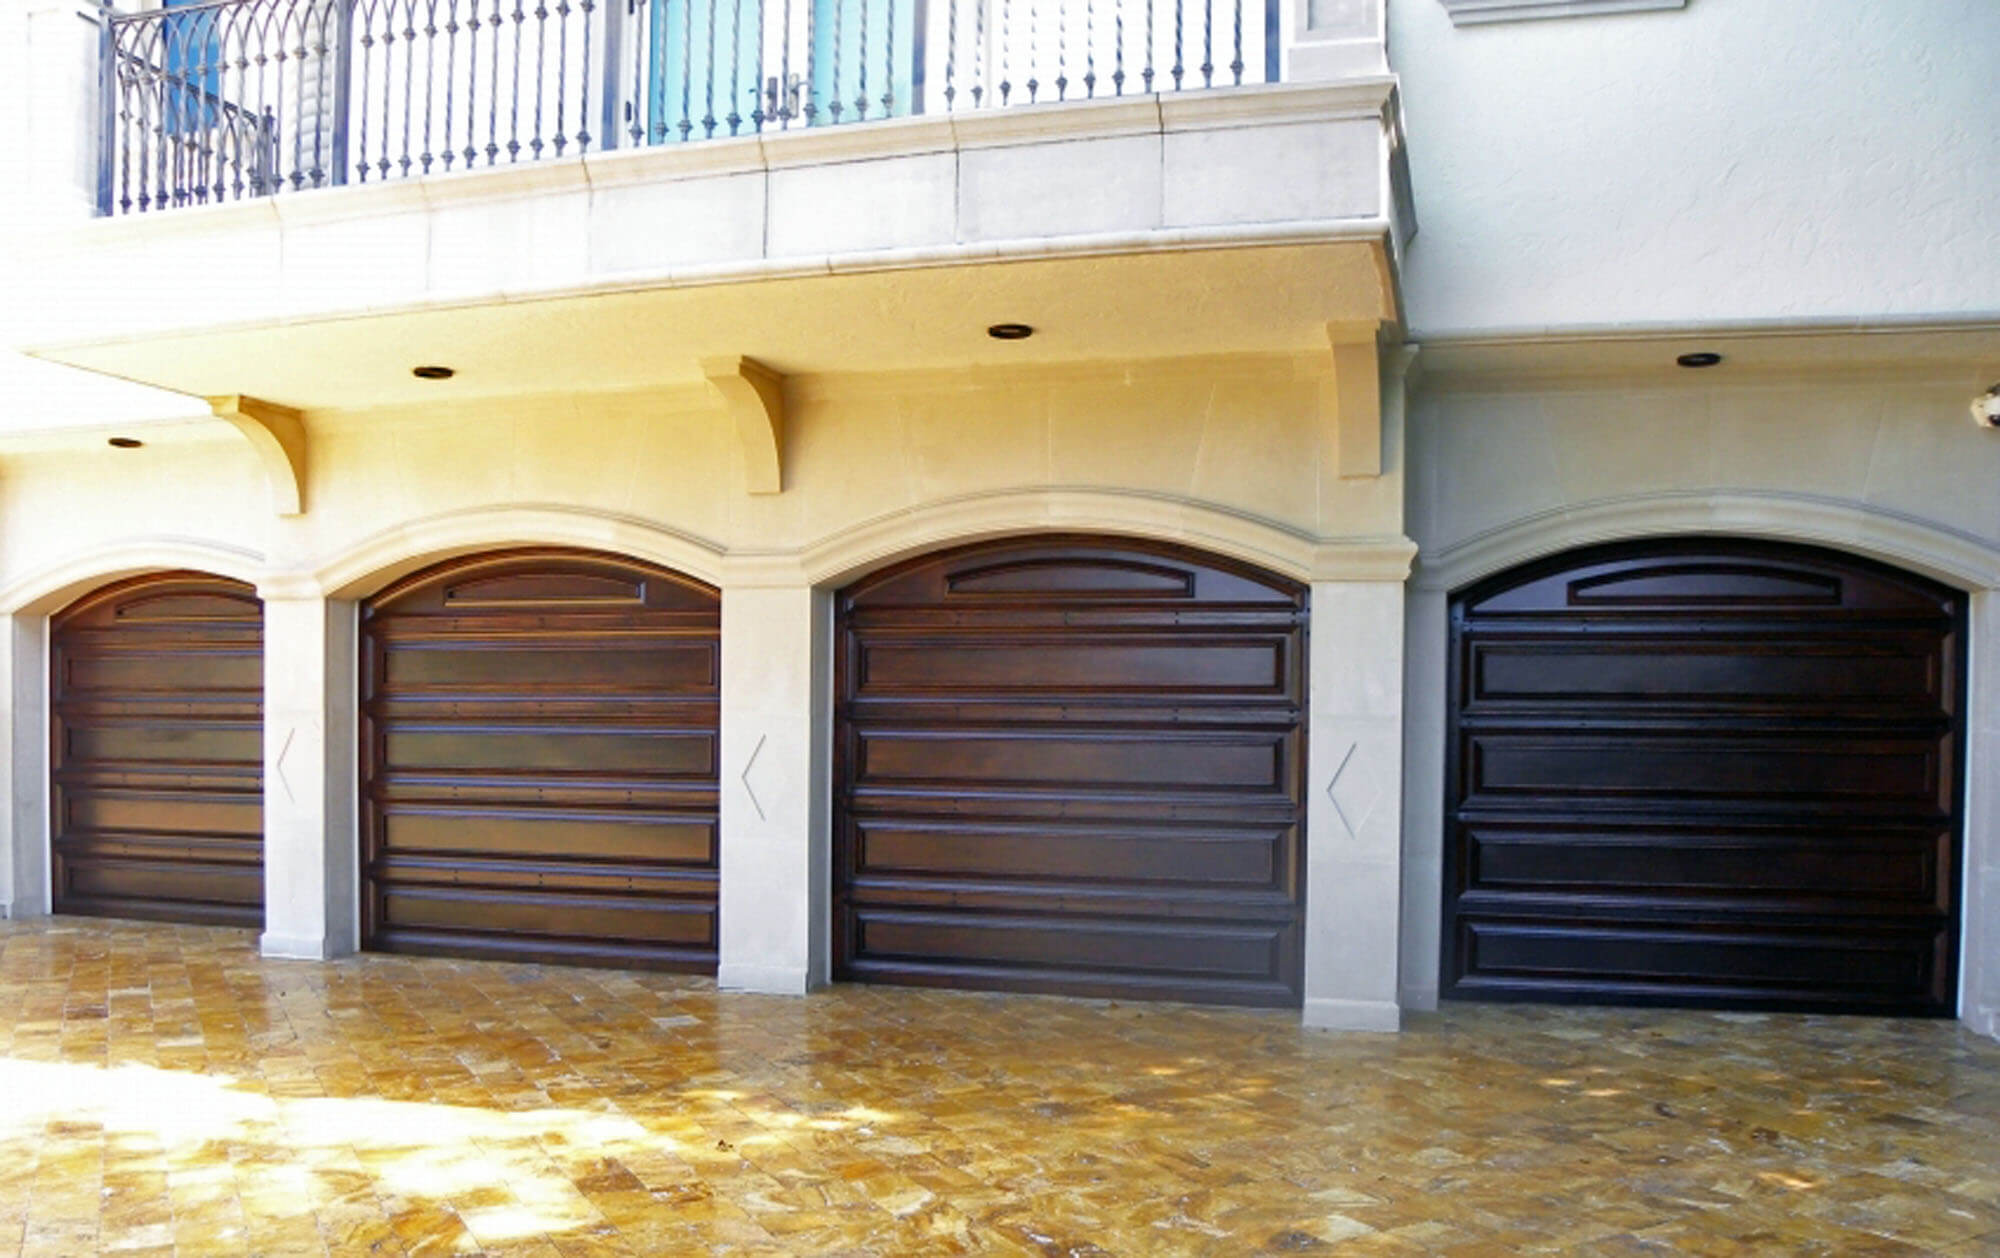 LAS OLAS MAHOGANY GARAGE DOORS.